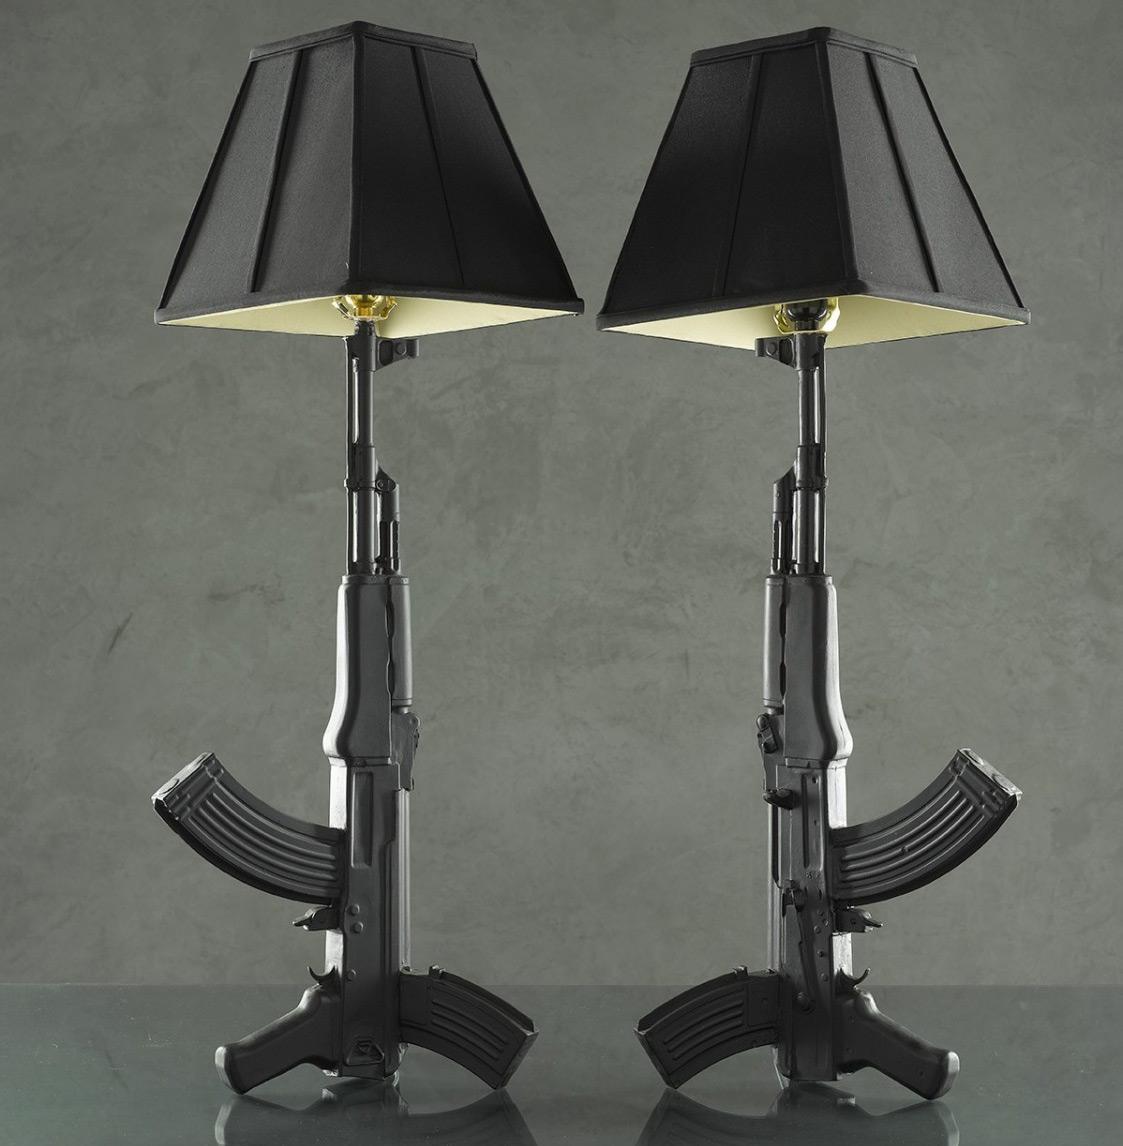 boondock saints lamp photo - 1